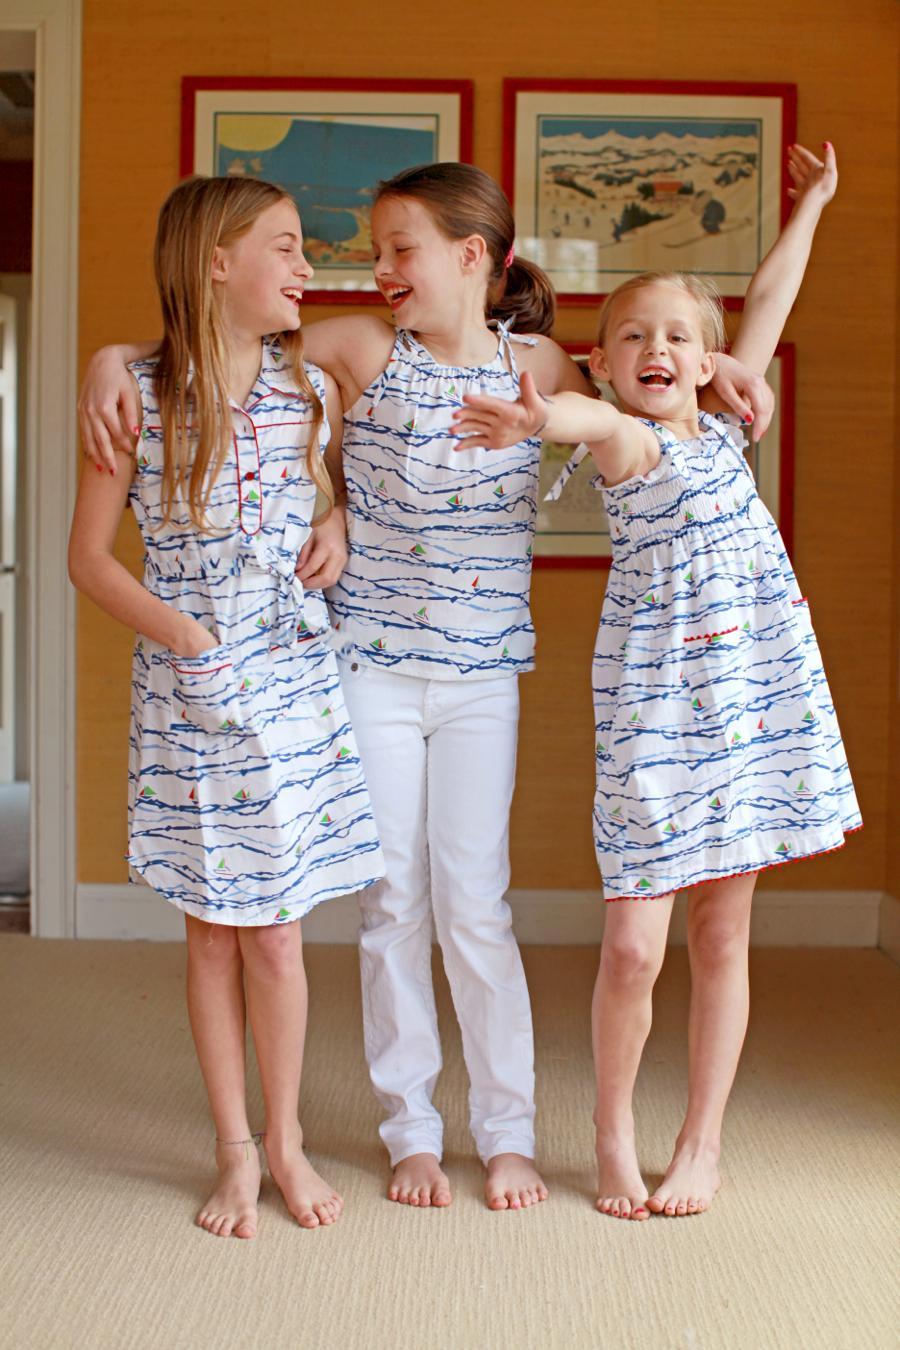 Kayce-hughes-home-nashville-fashion-designer-matchbook-magazine-2